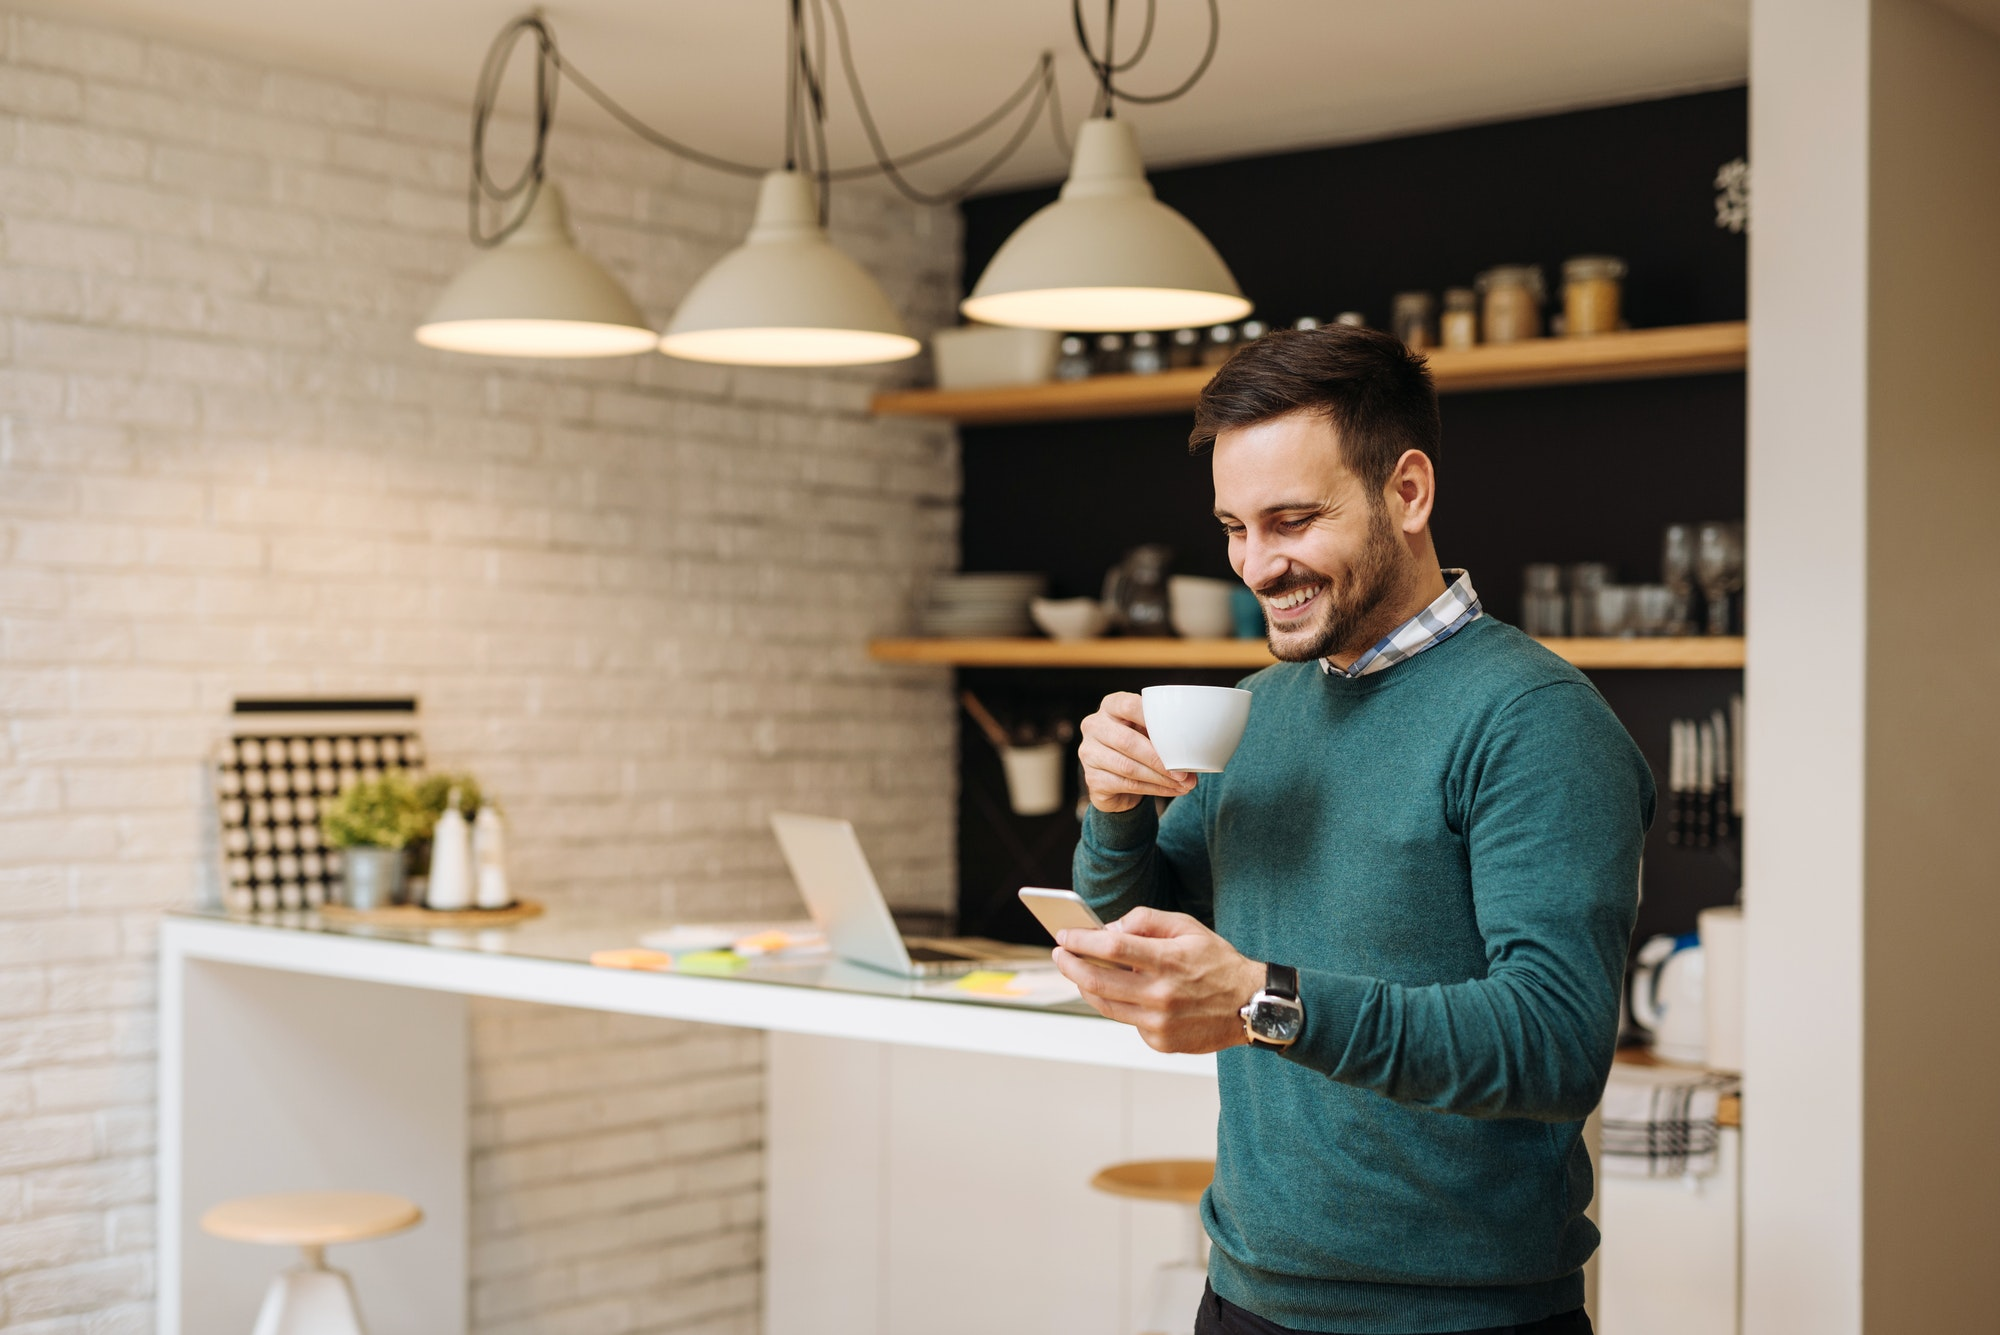 Wi fi and coffee